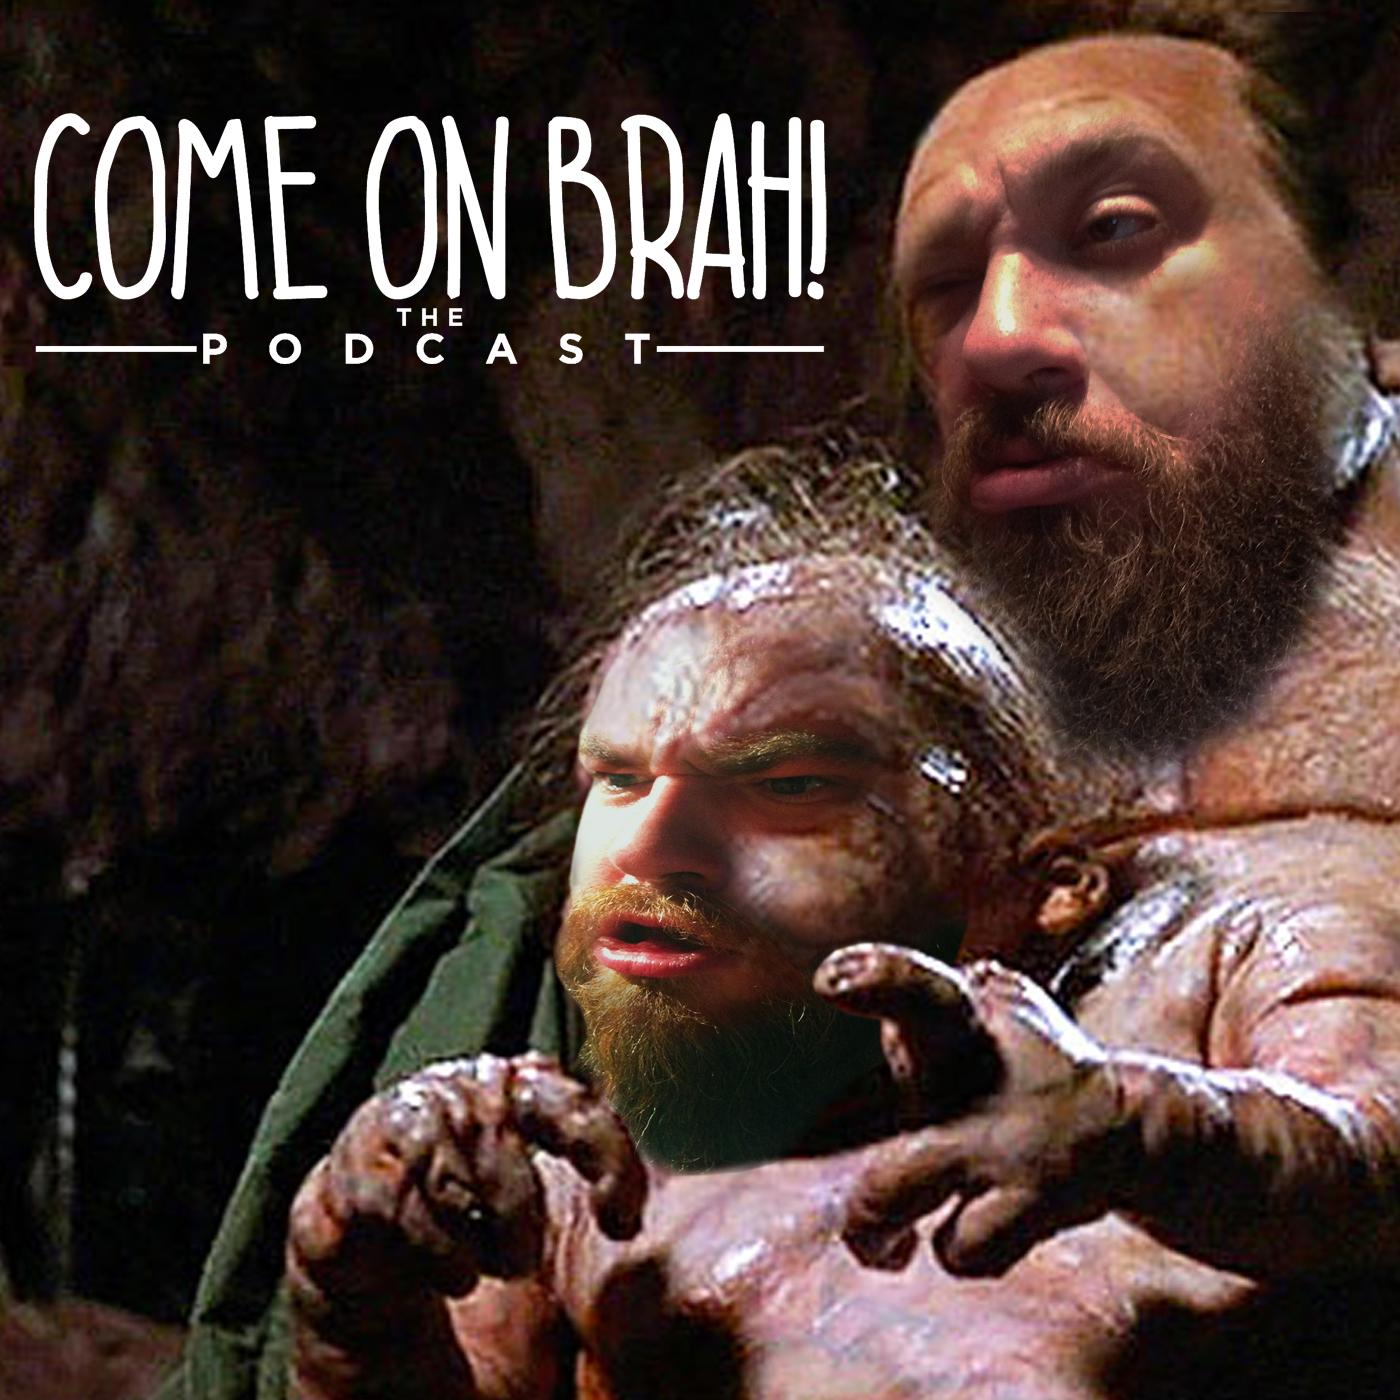 Come on Brah!